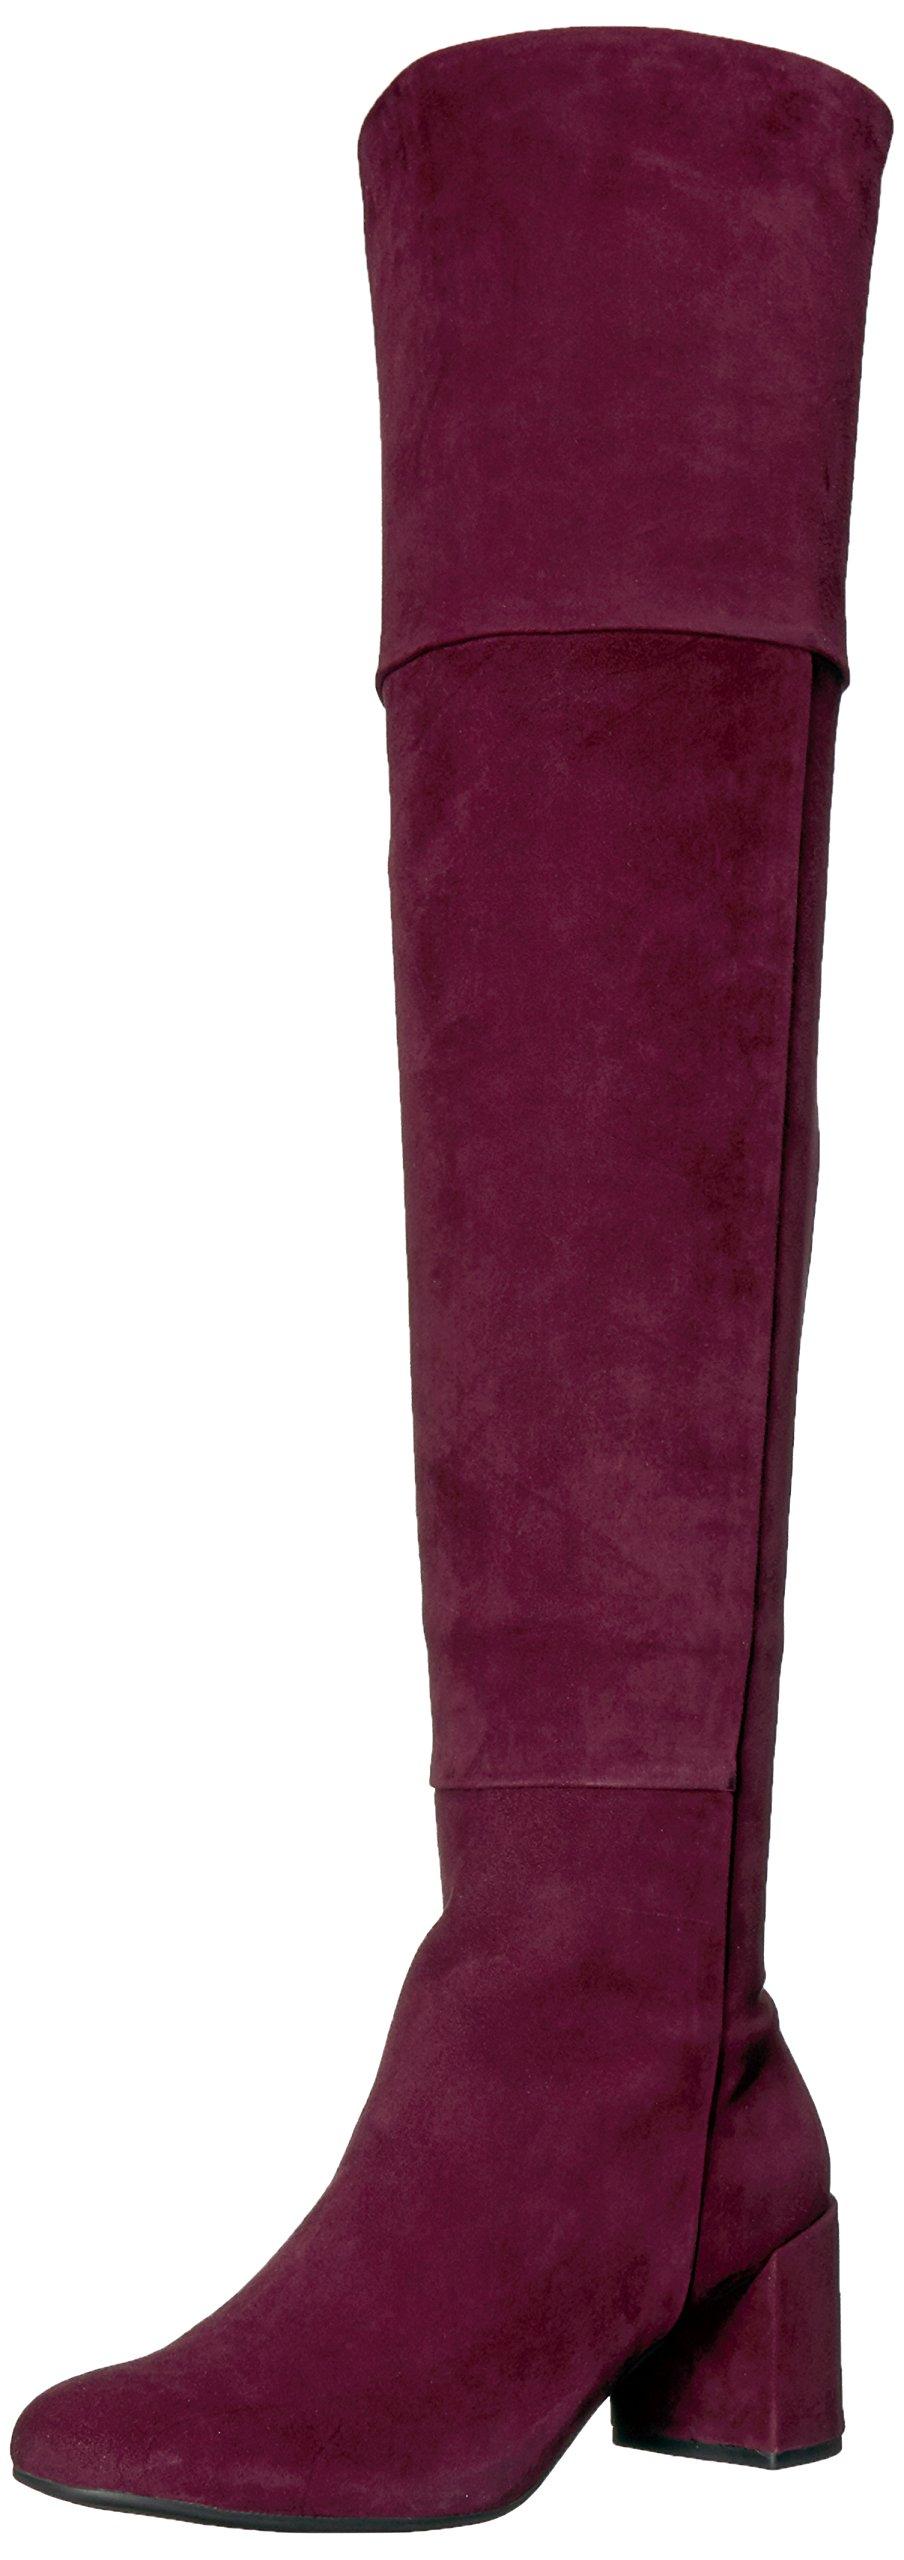 Taryn Rose Women's Catherine Silky Suede Fashion Boot, Wine, 9 M M US